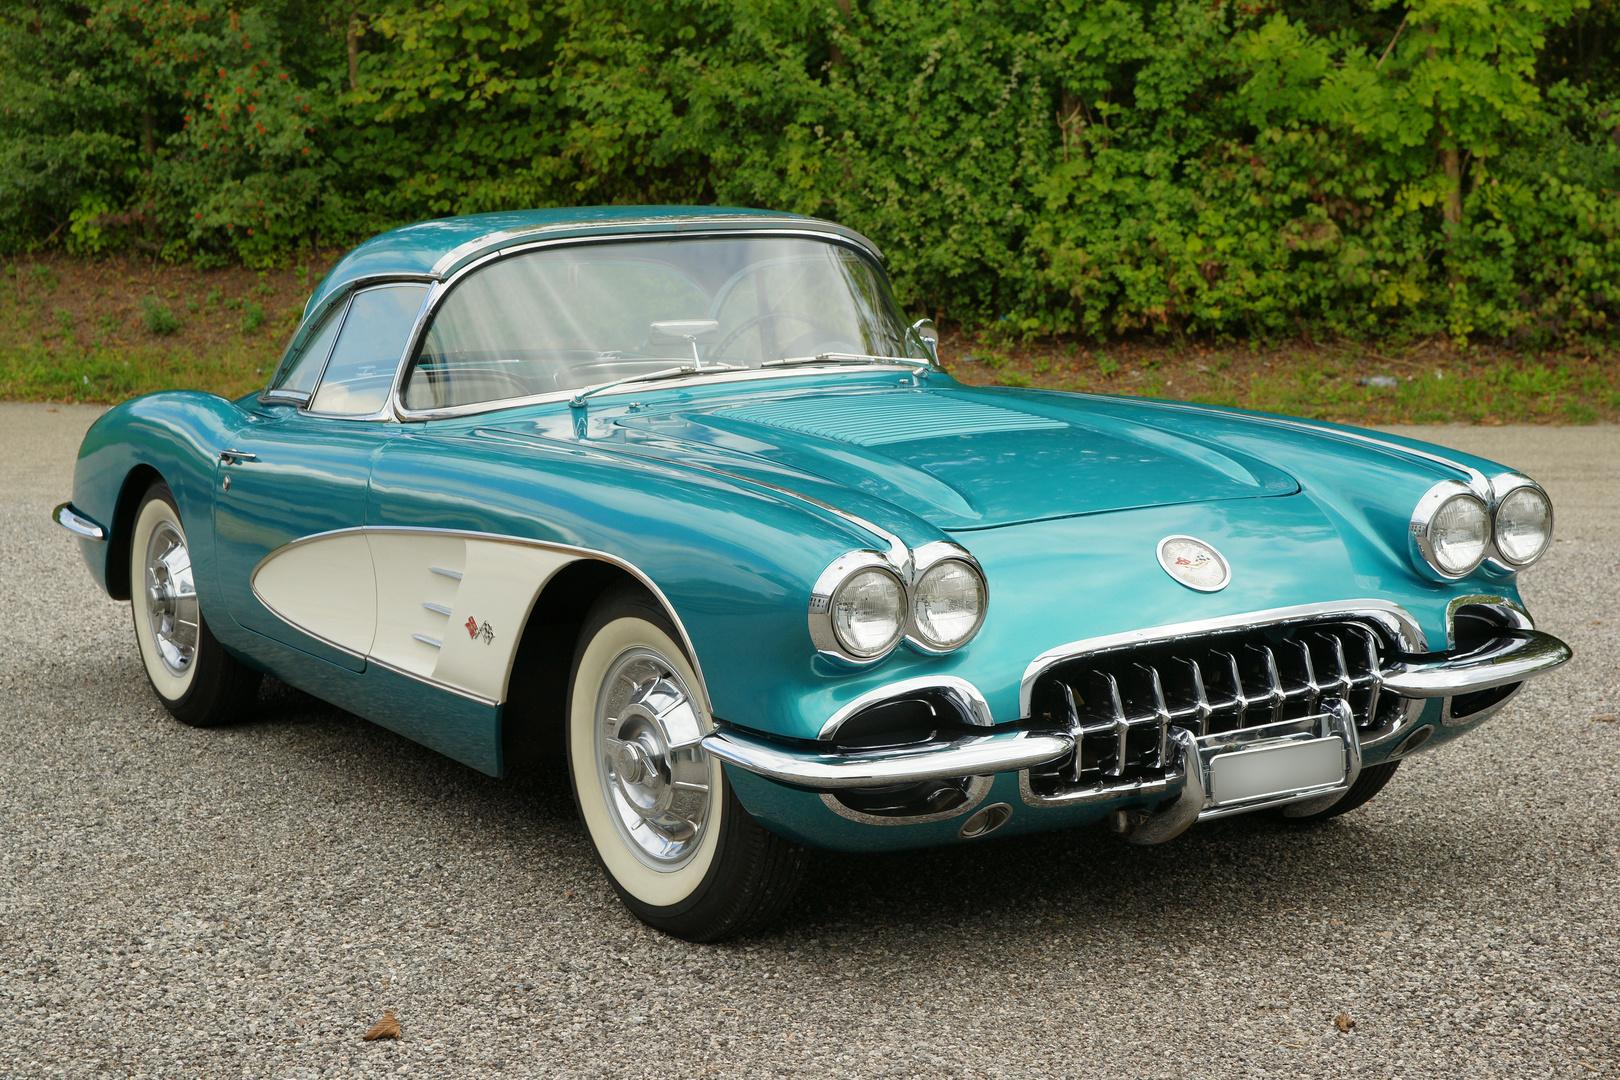 chevrolet corvette c1 1958 foto bild autos zweir der. Black Bedroom Furniture Sets. Home Design Ideas